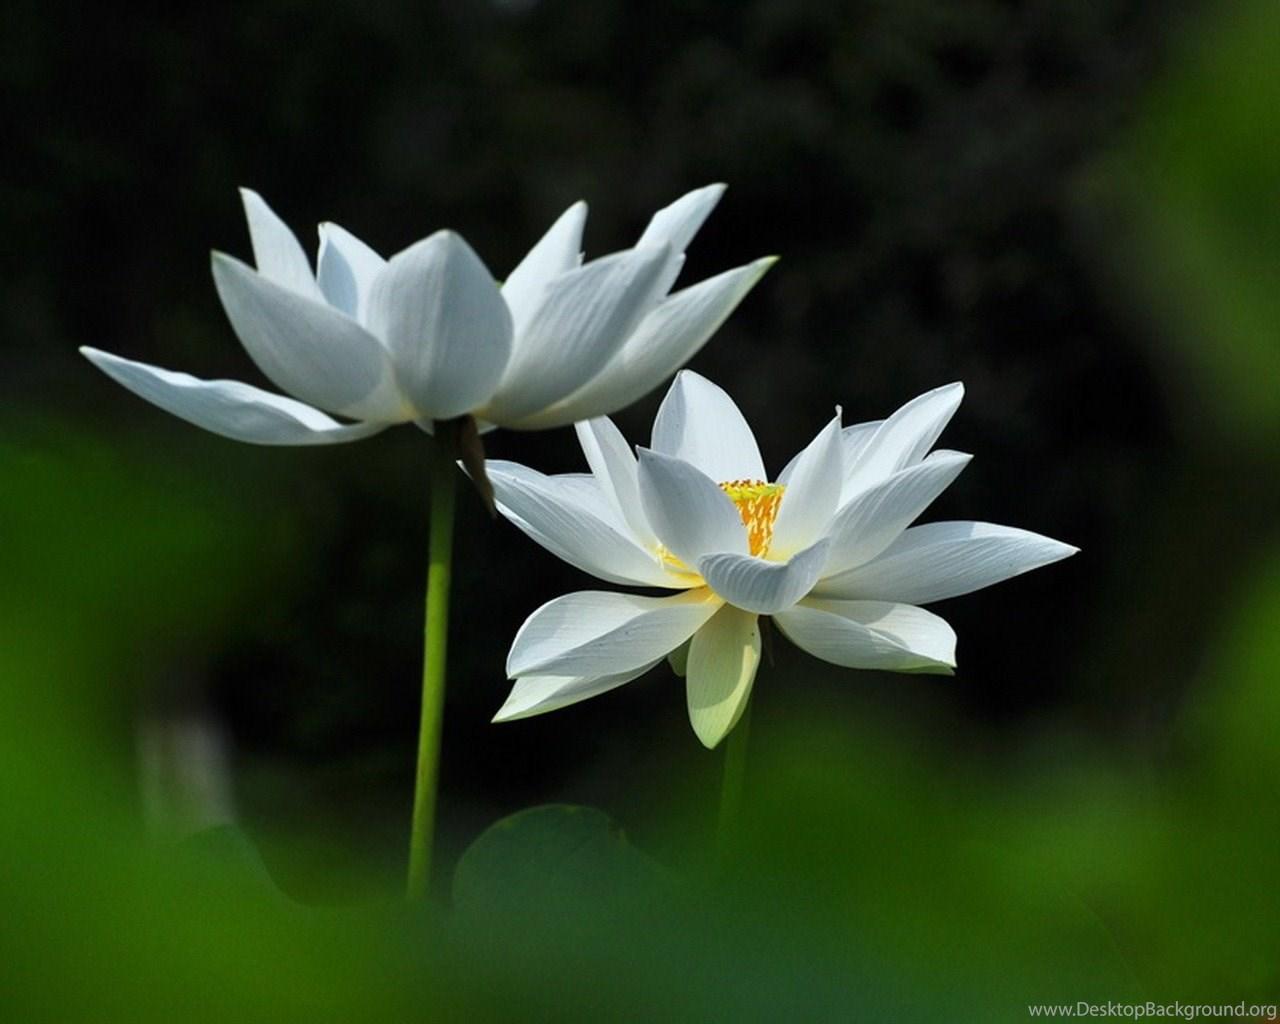 Joan powder jade white lotus flower photography wallpapers widescreen mightylinksfo